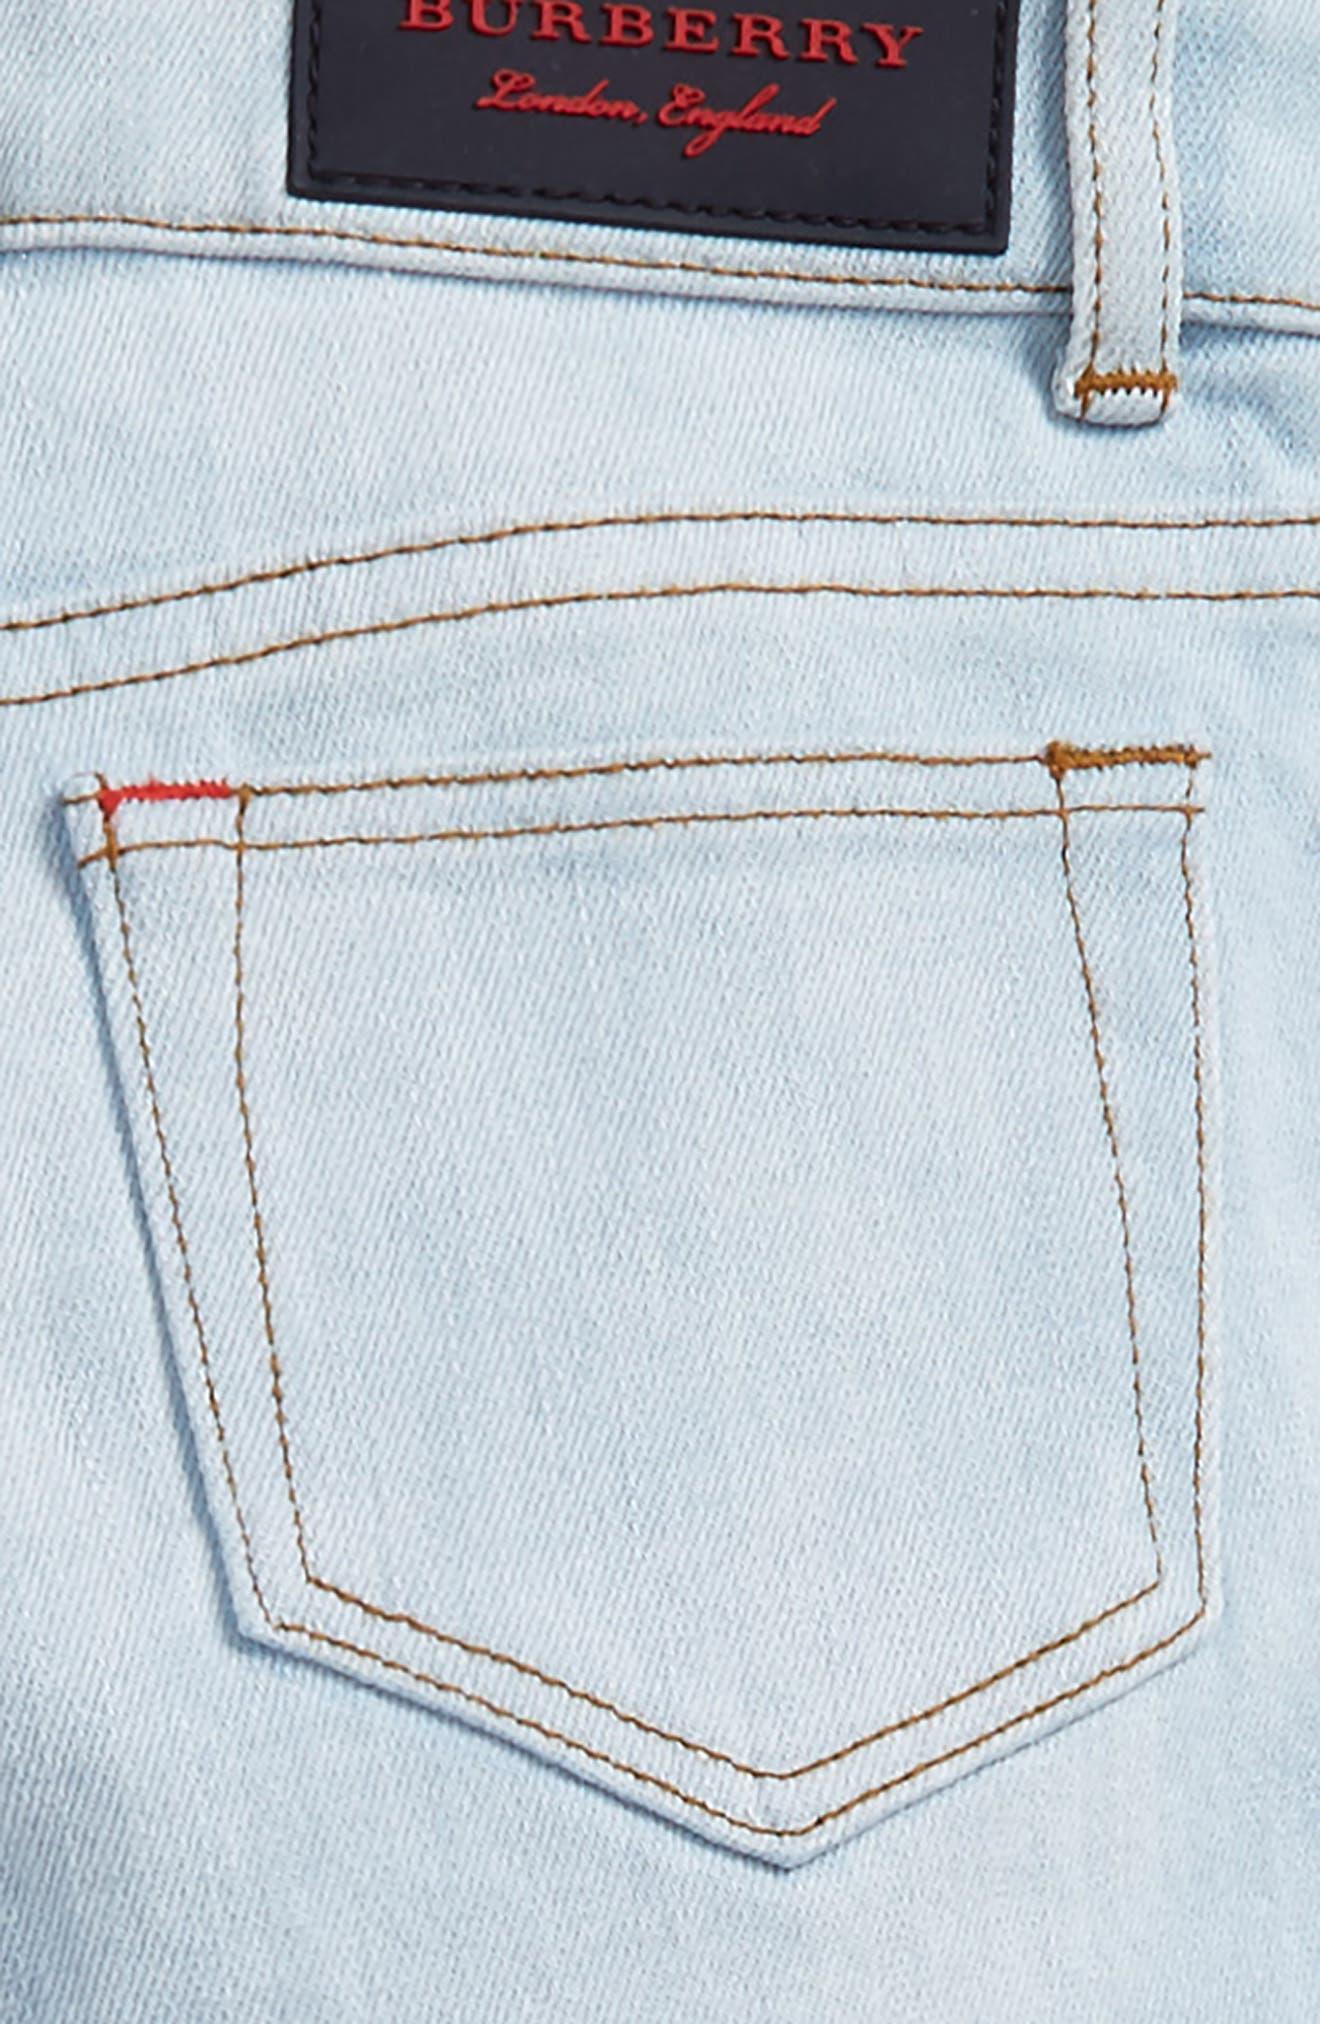 Check Cuff Straight Leg Jeans,                             Alternate thumbnail 6, color,